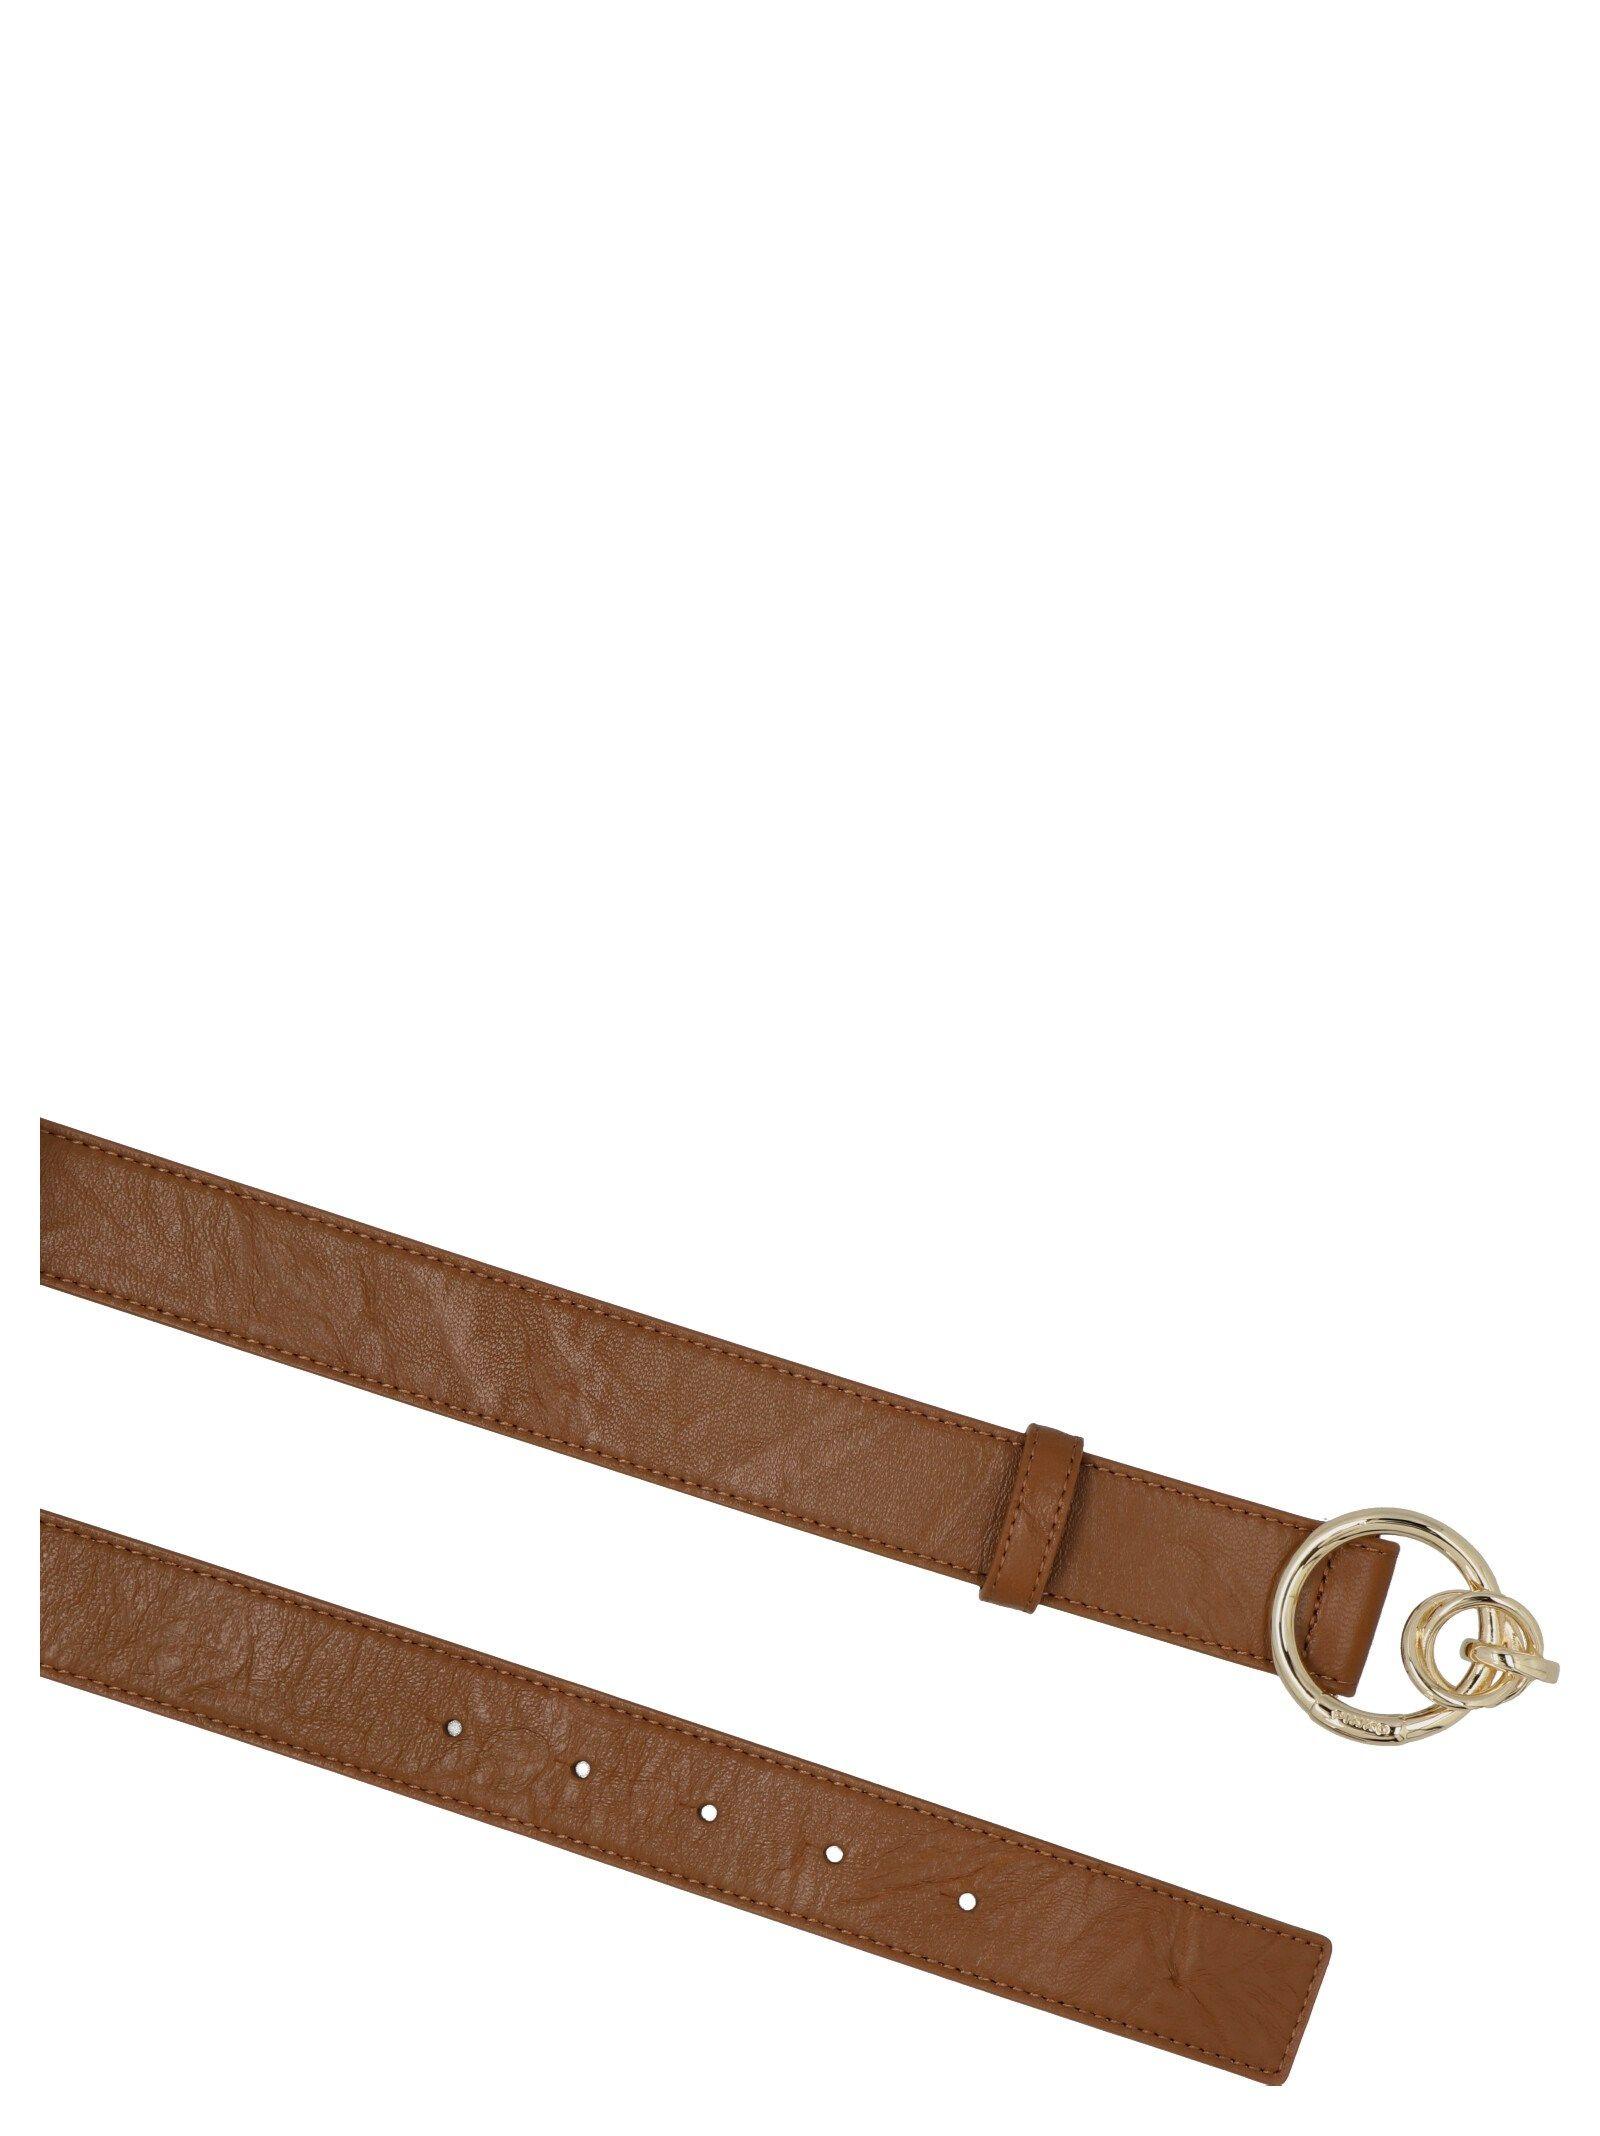 PINKO Belts PINKO WOMEN'S BROWN OTHER MATERIALS BELT